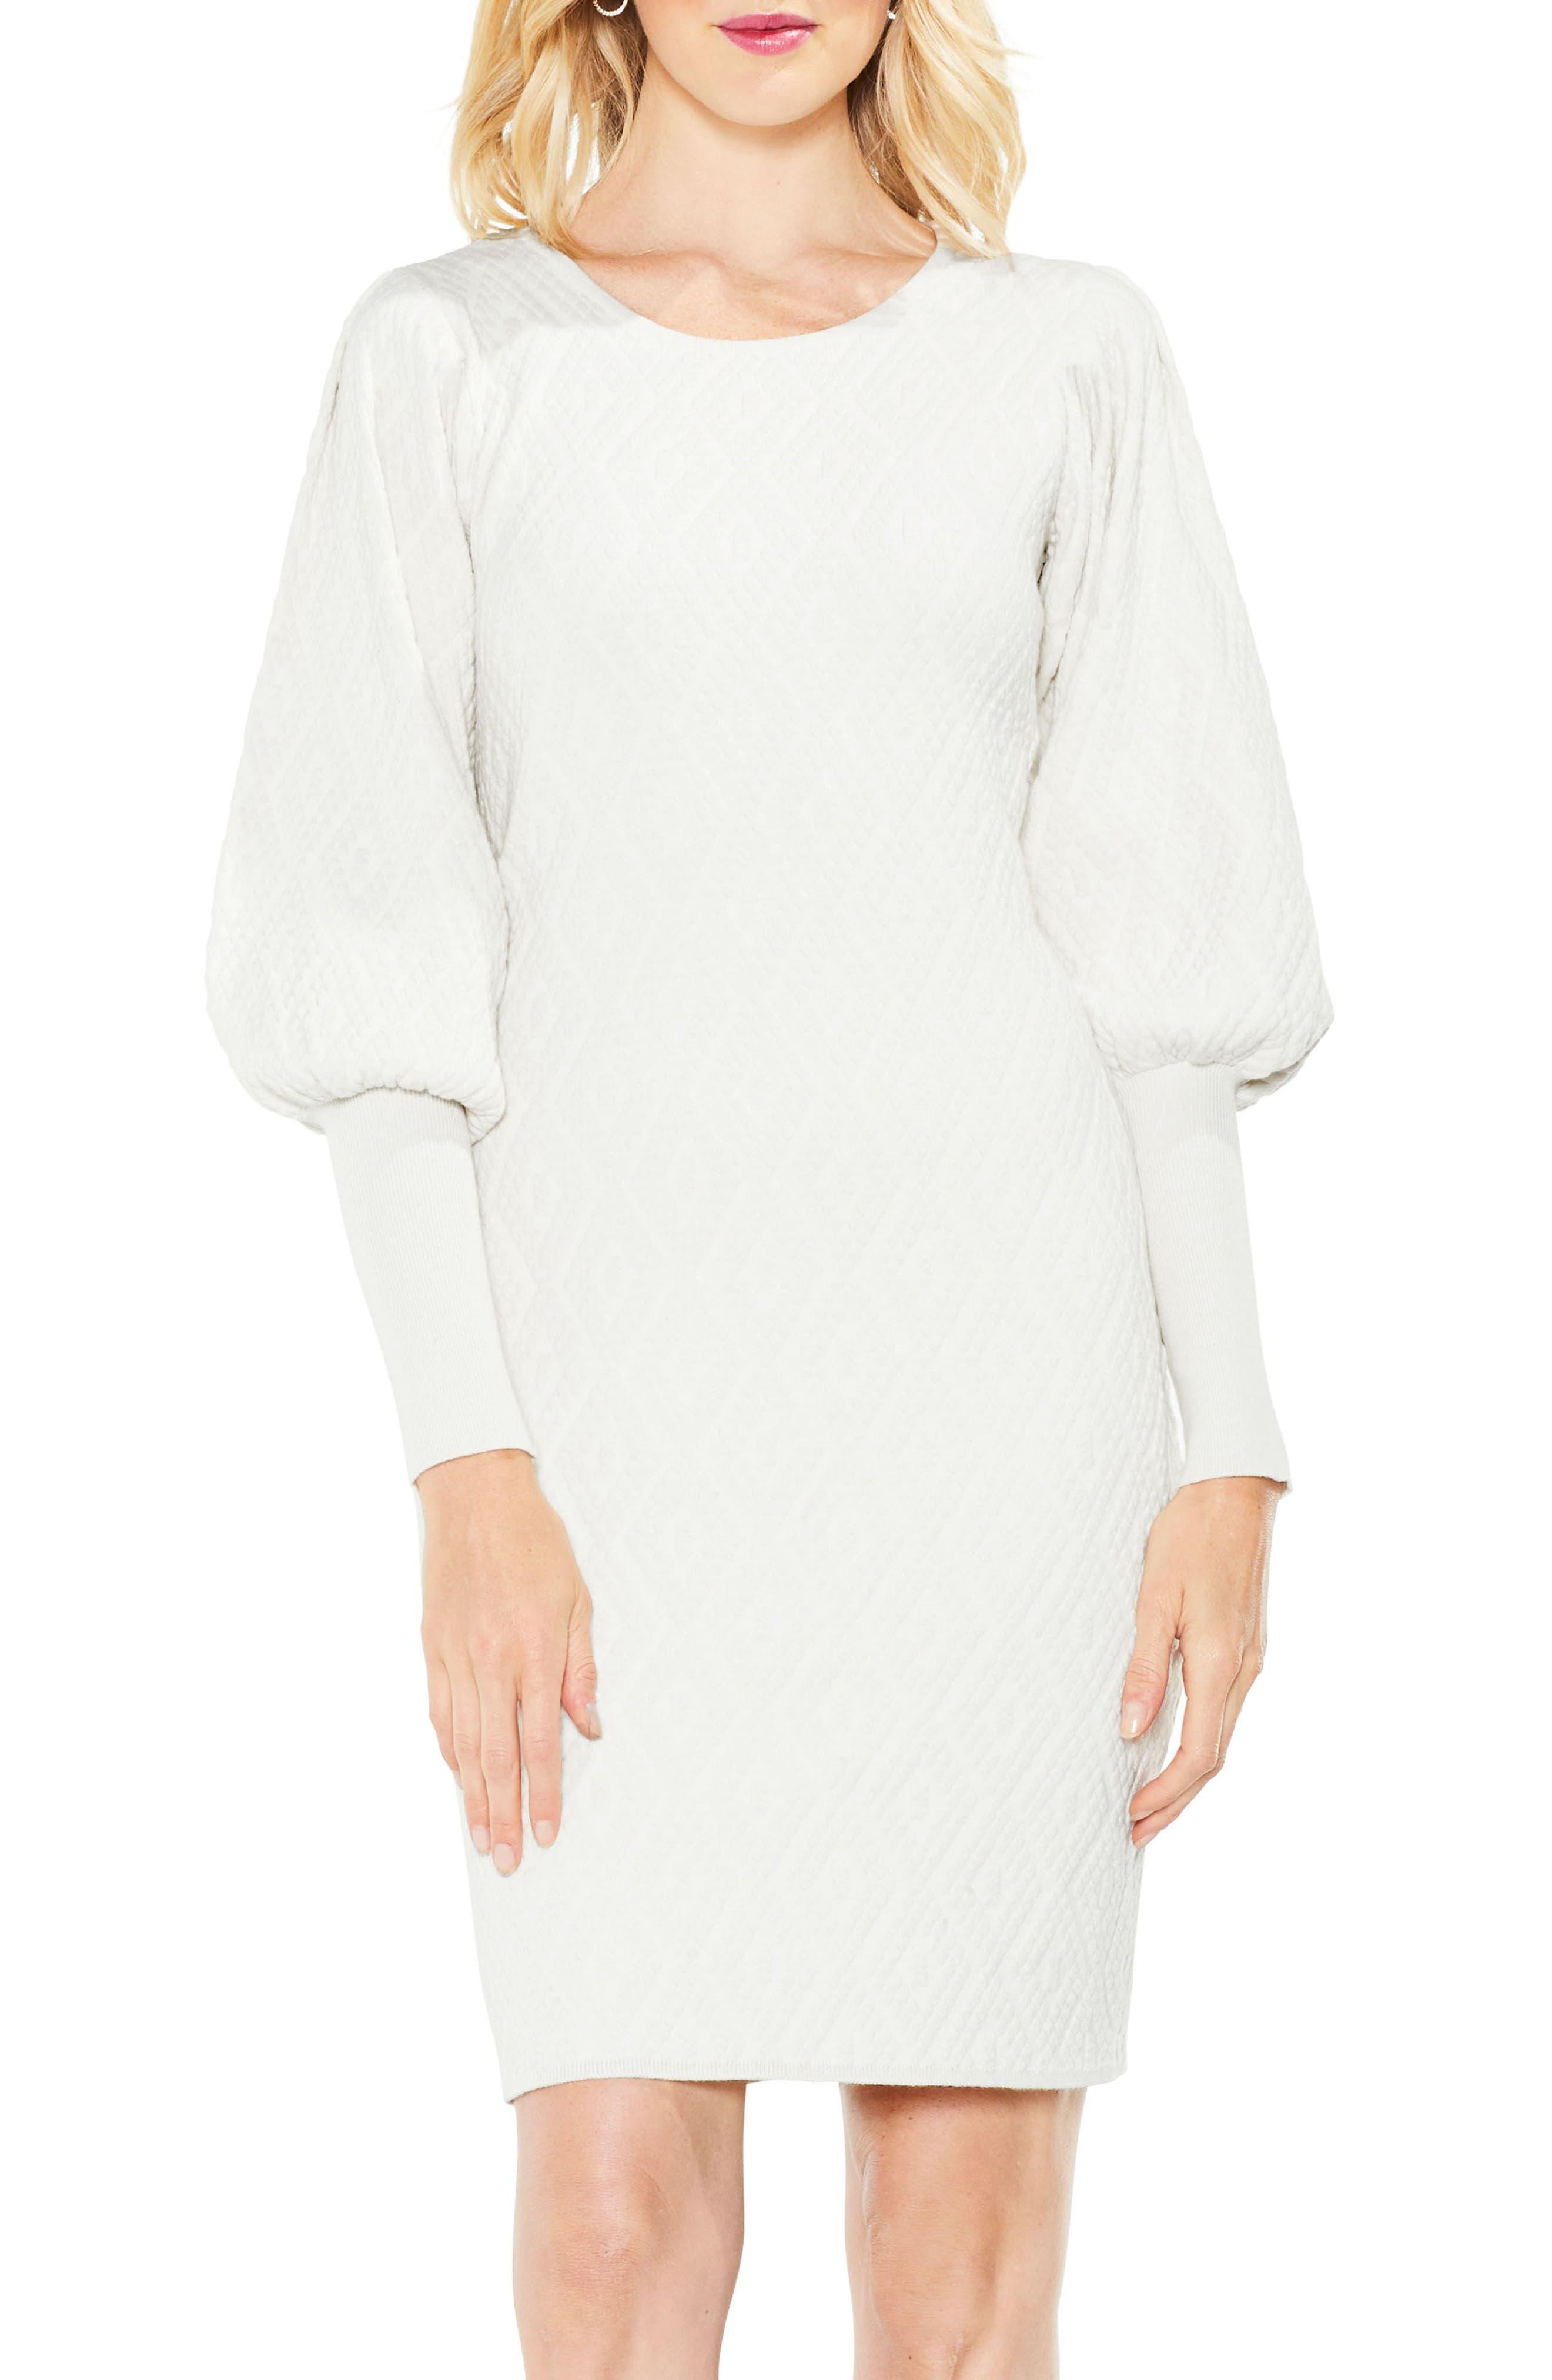 Main Image - Vince Camuto Bubble Sleeve Textured Jacquard Dress